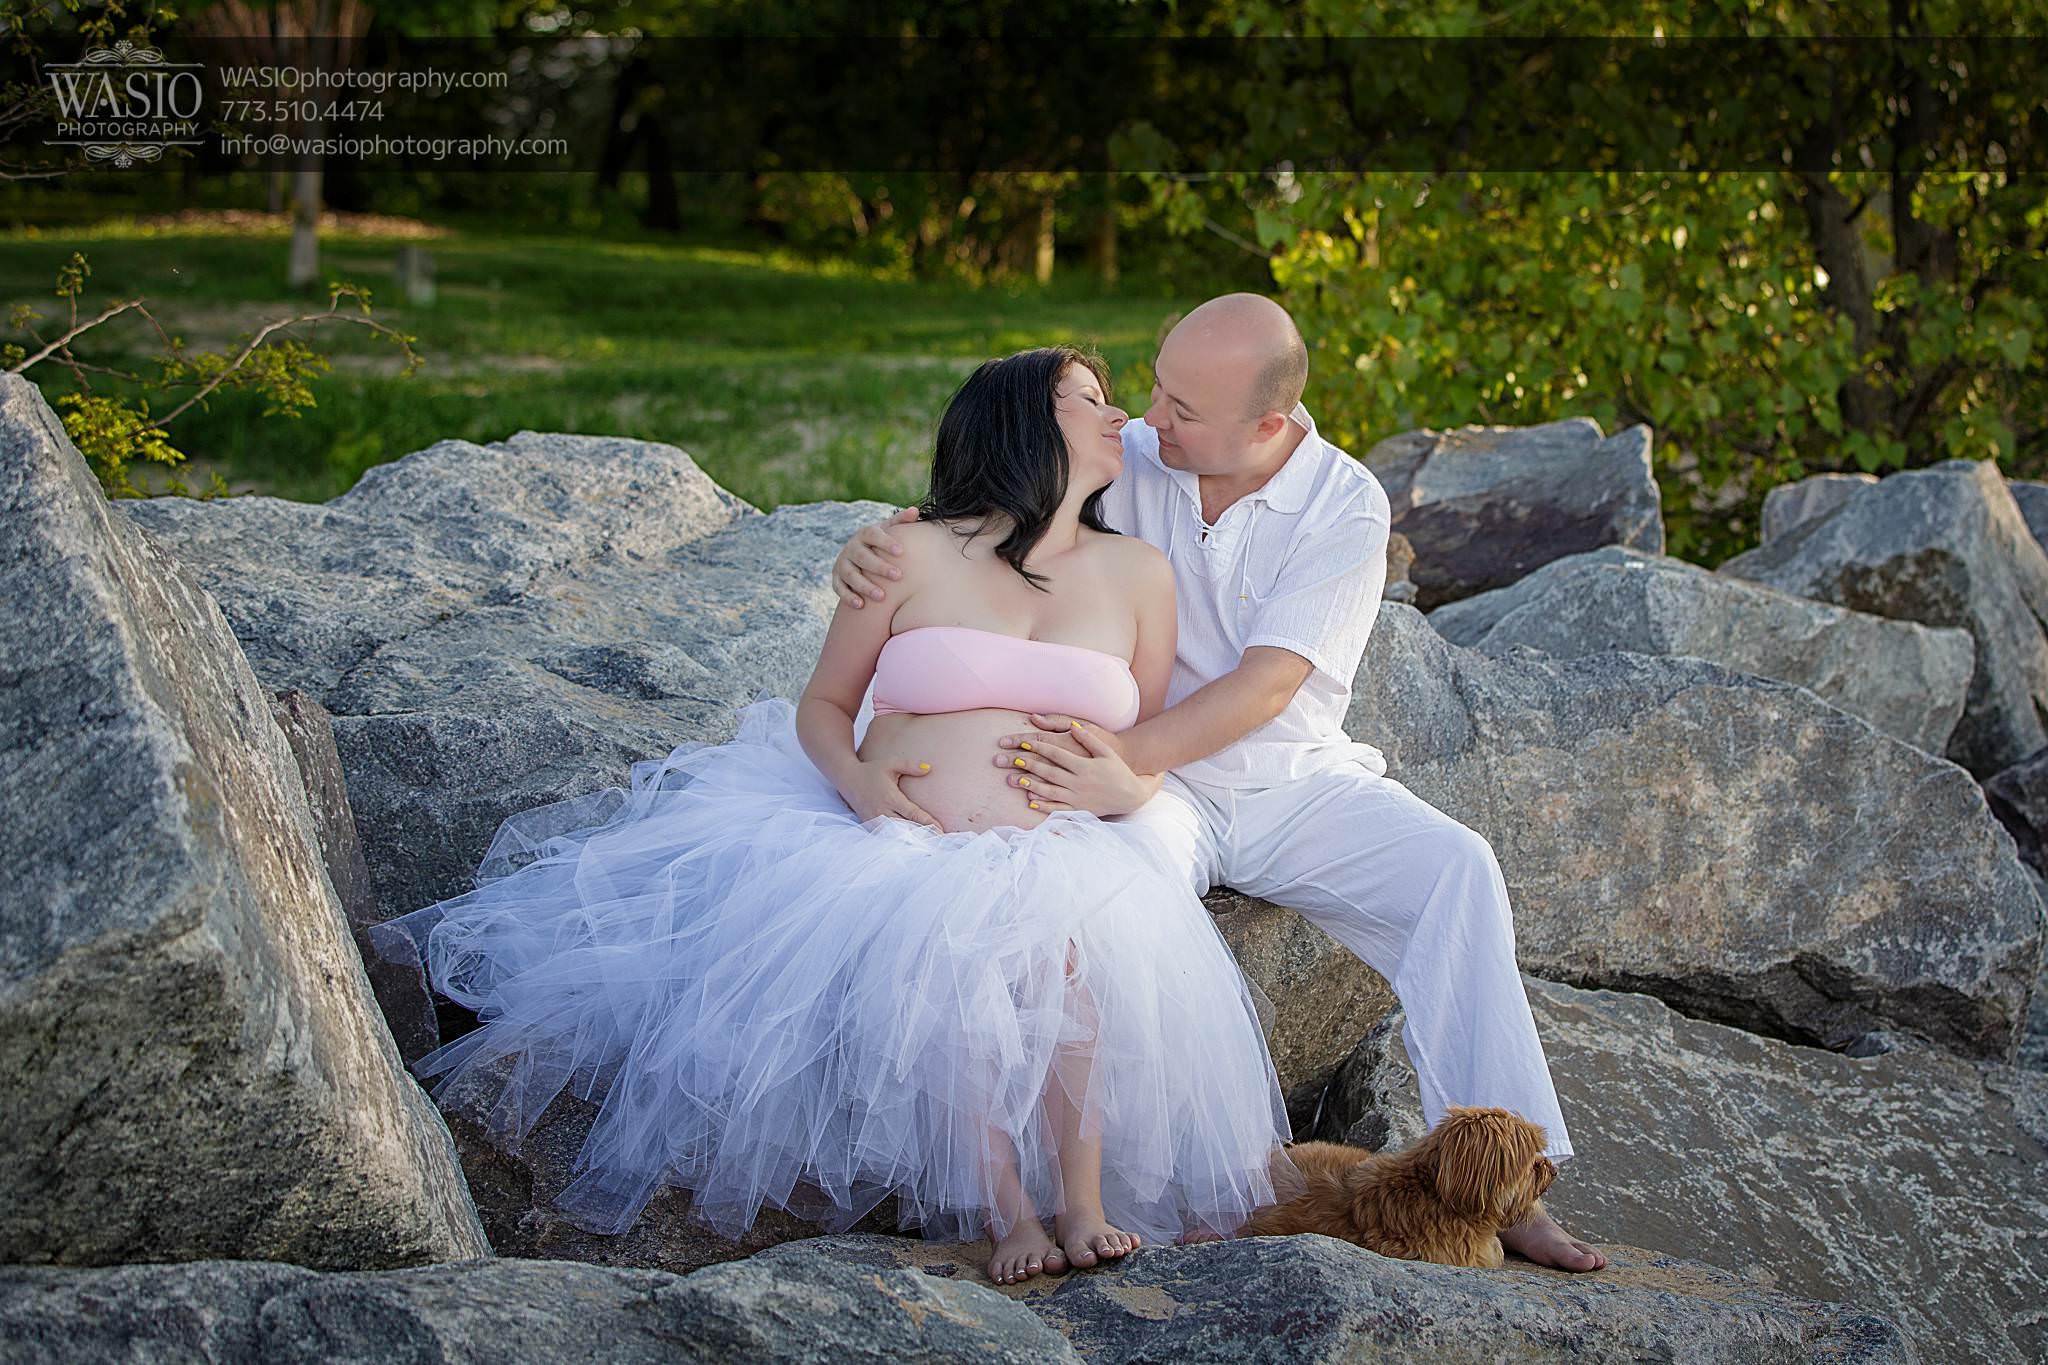 Chicago-maternity-photos-romantic-wife-husband-134 Chicago Maternity Photos - Mayya